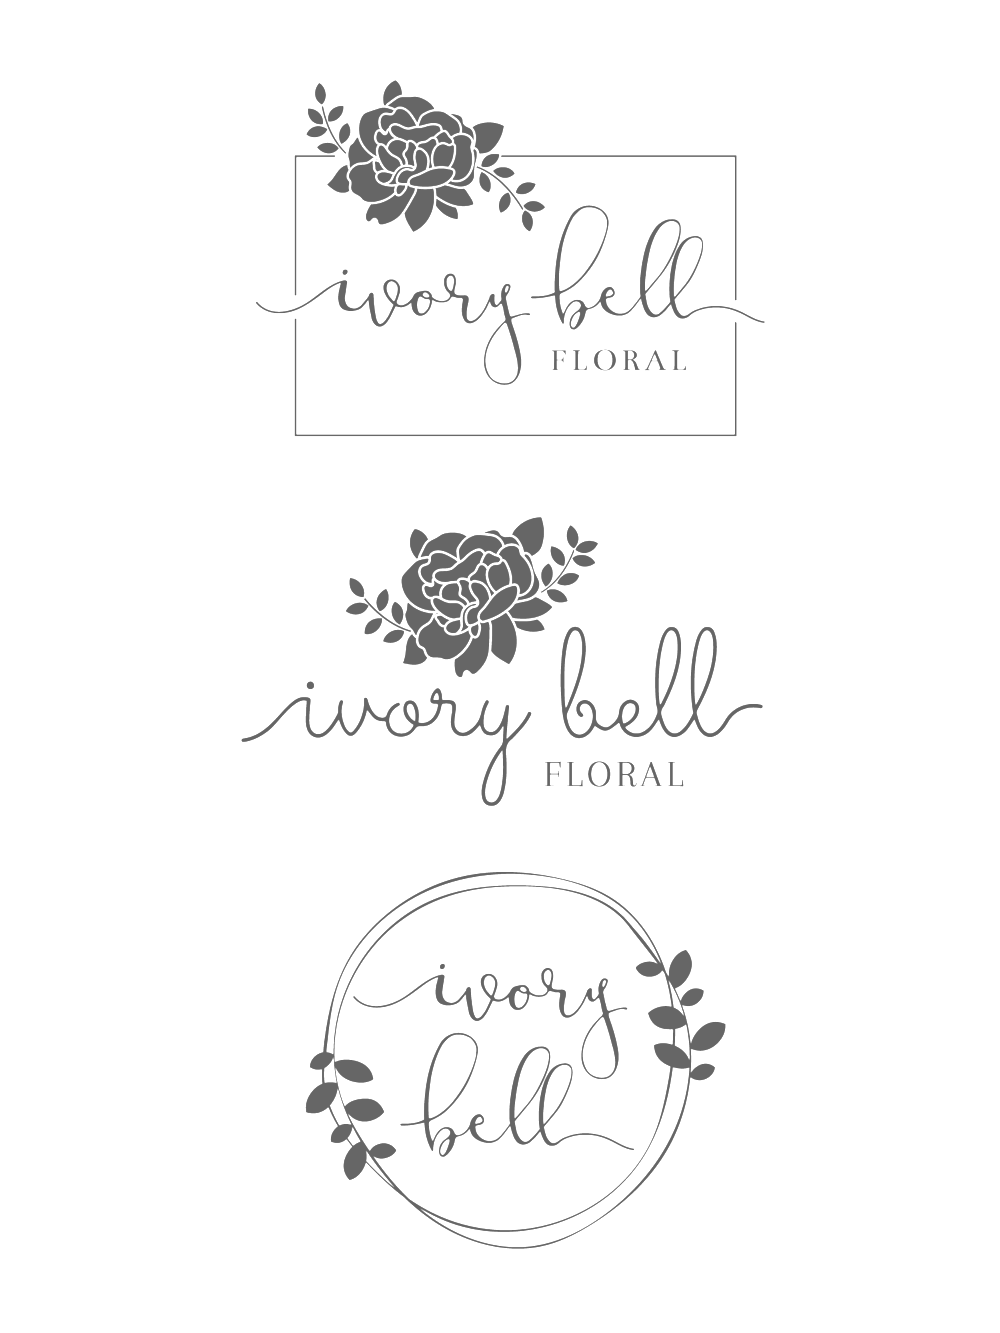 Ivory Bell Floral Logo & Branding Bea & Bloom Creative Design Studio